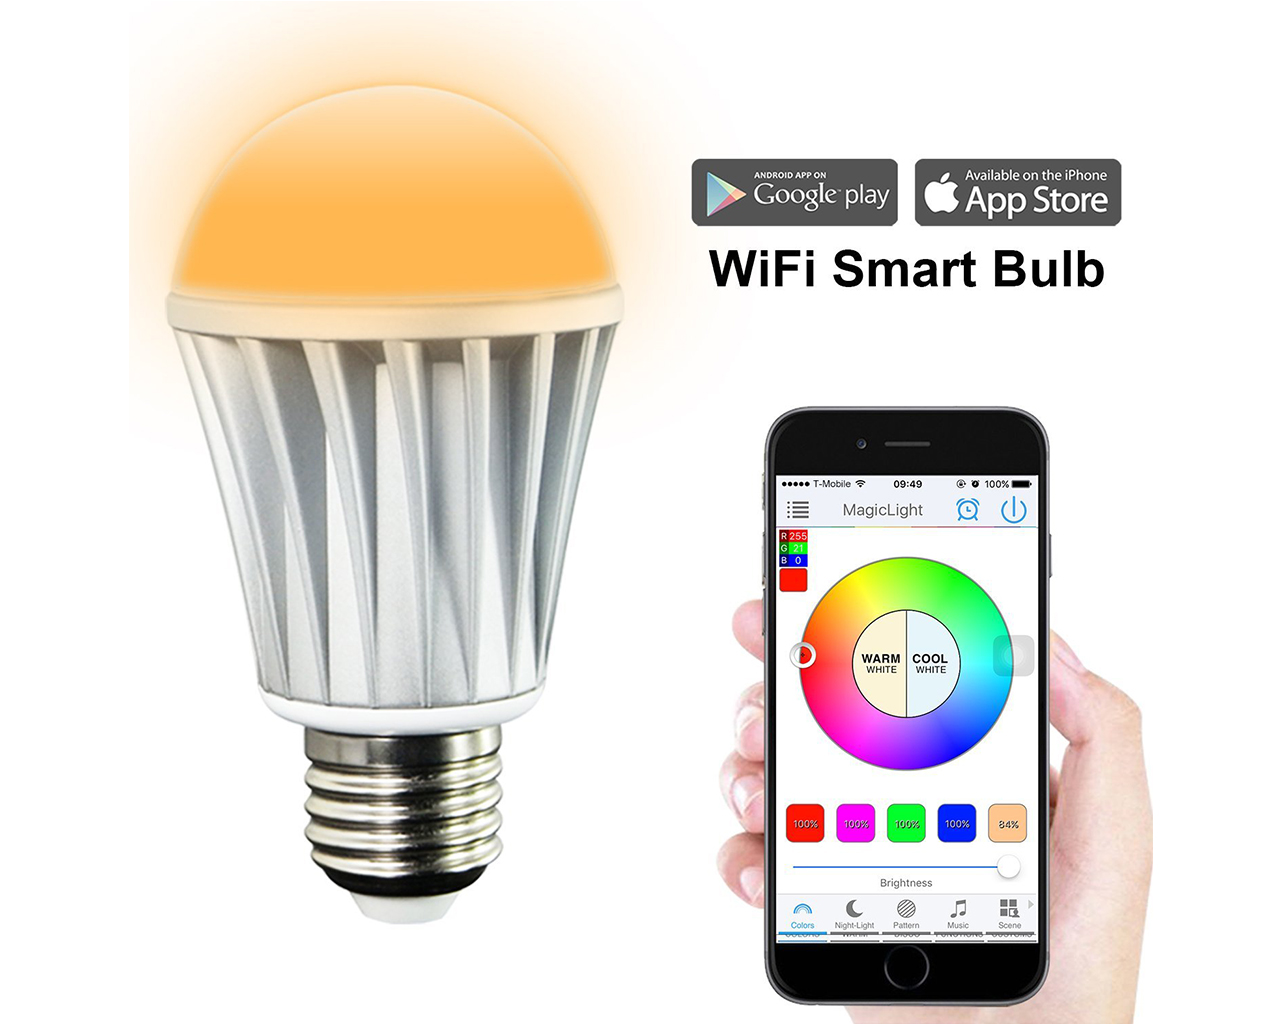 magiclight-wifi-smart-led-light-bulb